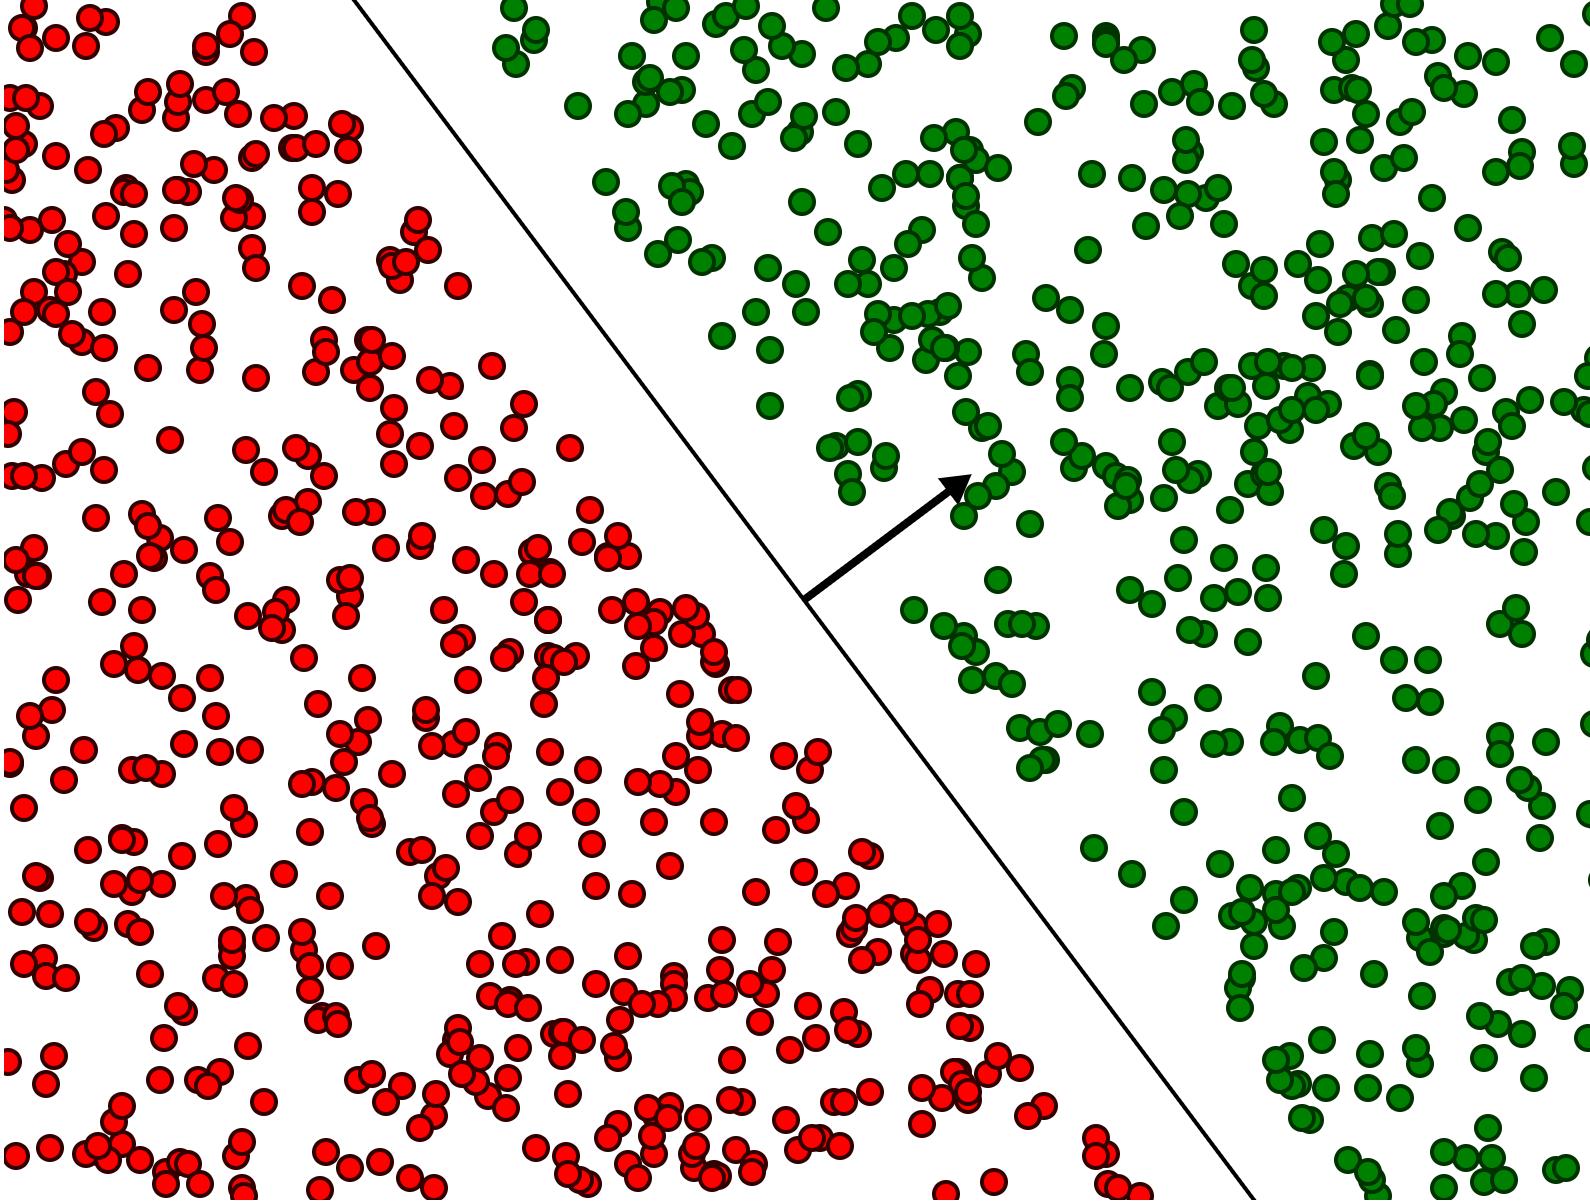 optimal_example.png